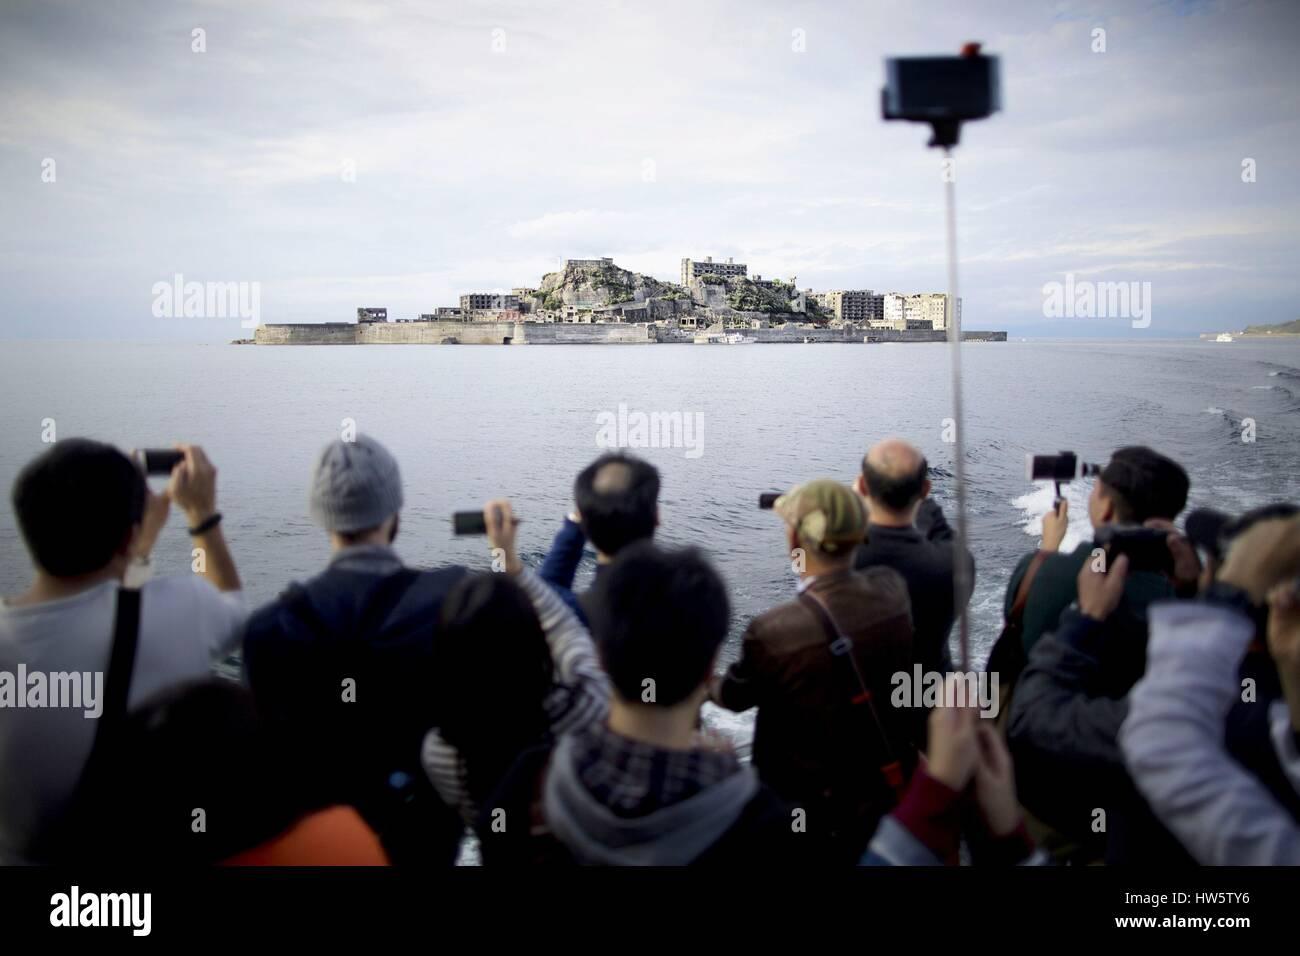 Japan, Kyushu, Nagasaki, Hashima island - Stock Image